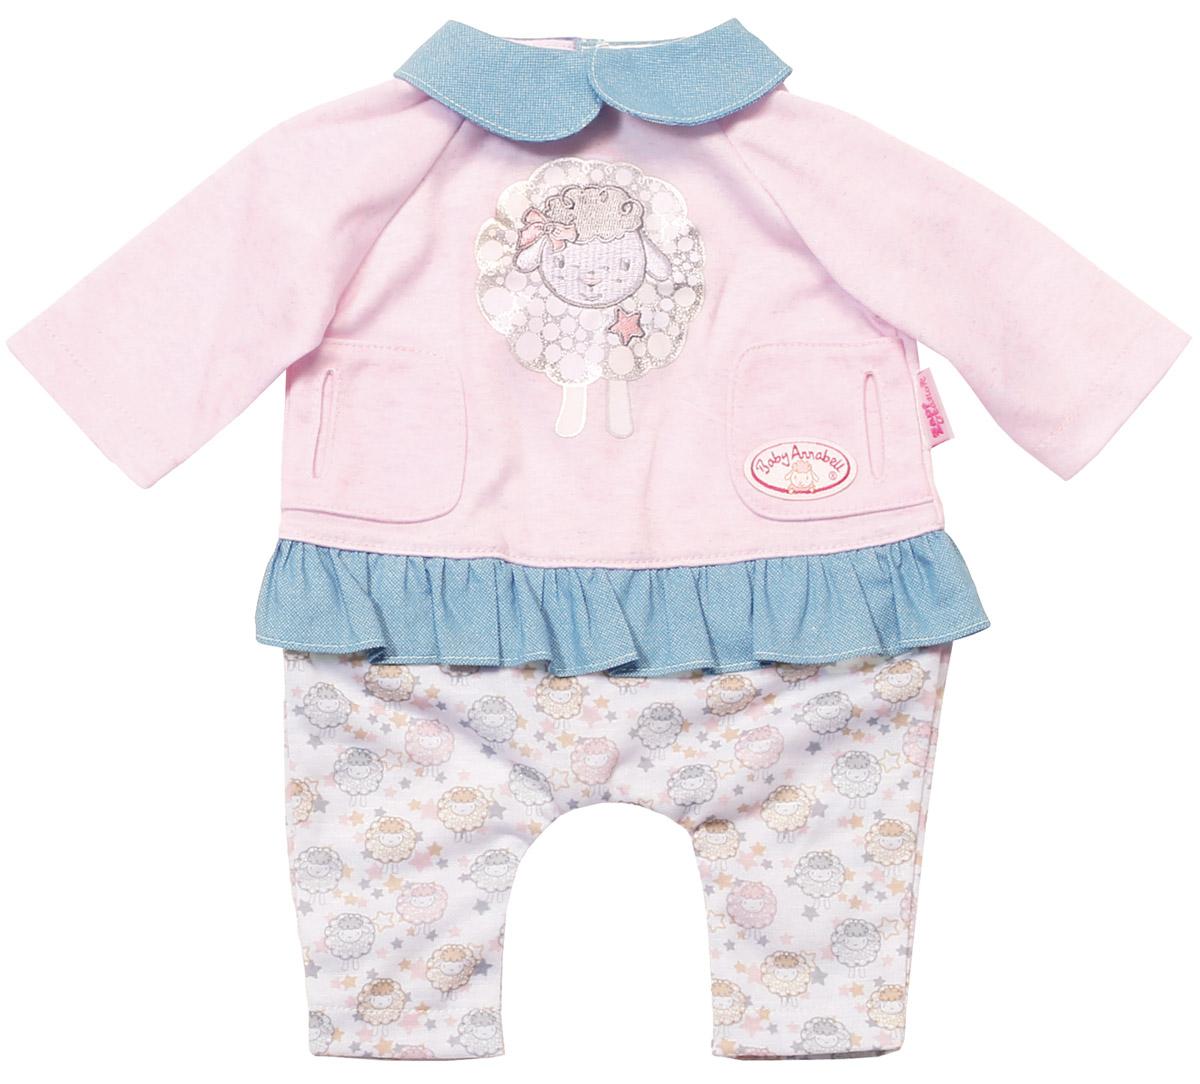 Baby Annabell Одежда для куклы Спокойной ночи игрушка baby annabell кроватка спокойной ночи кор